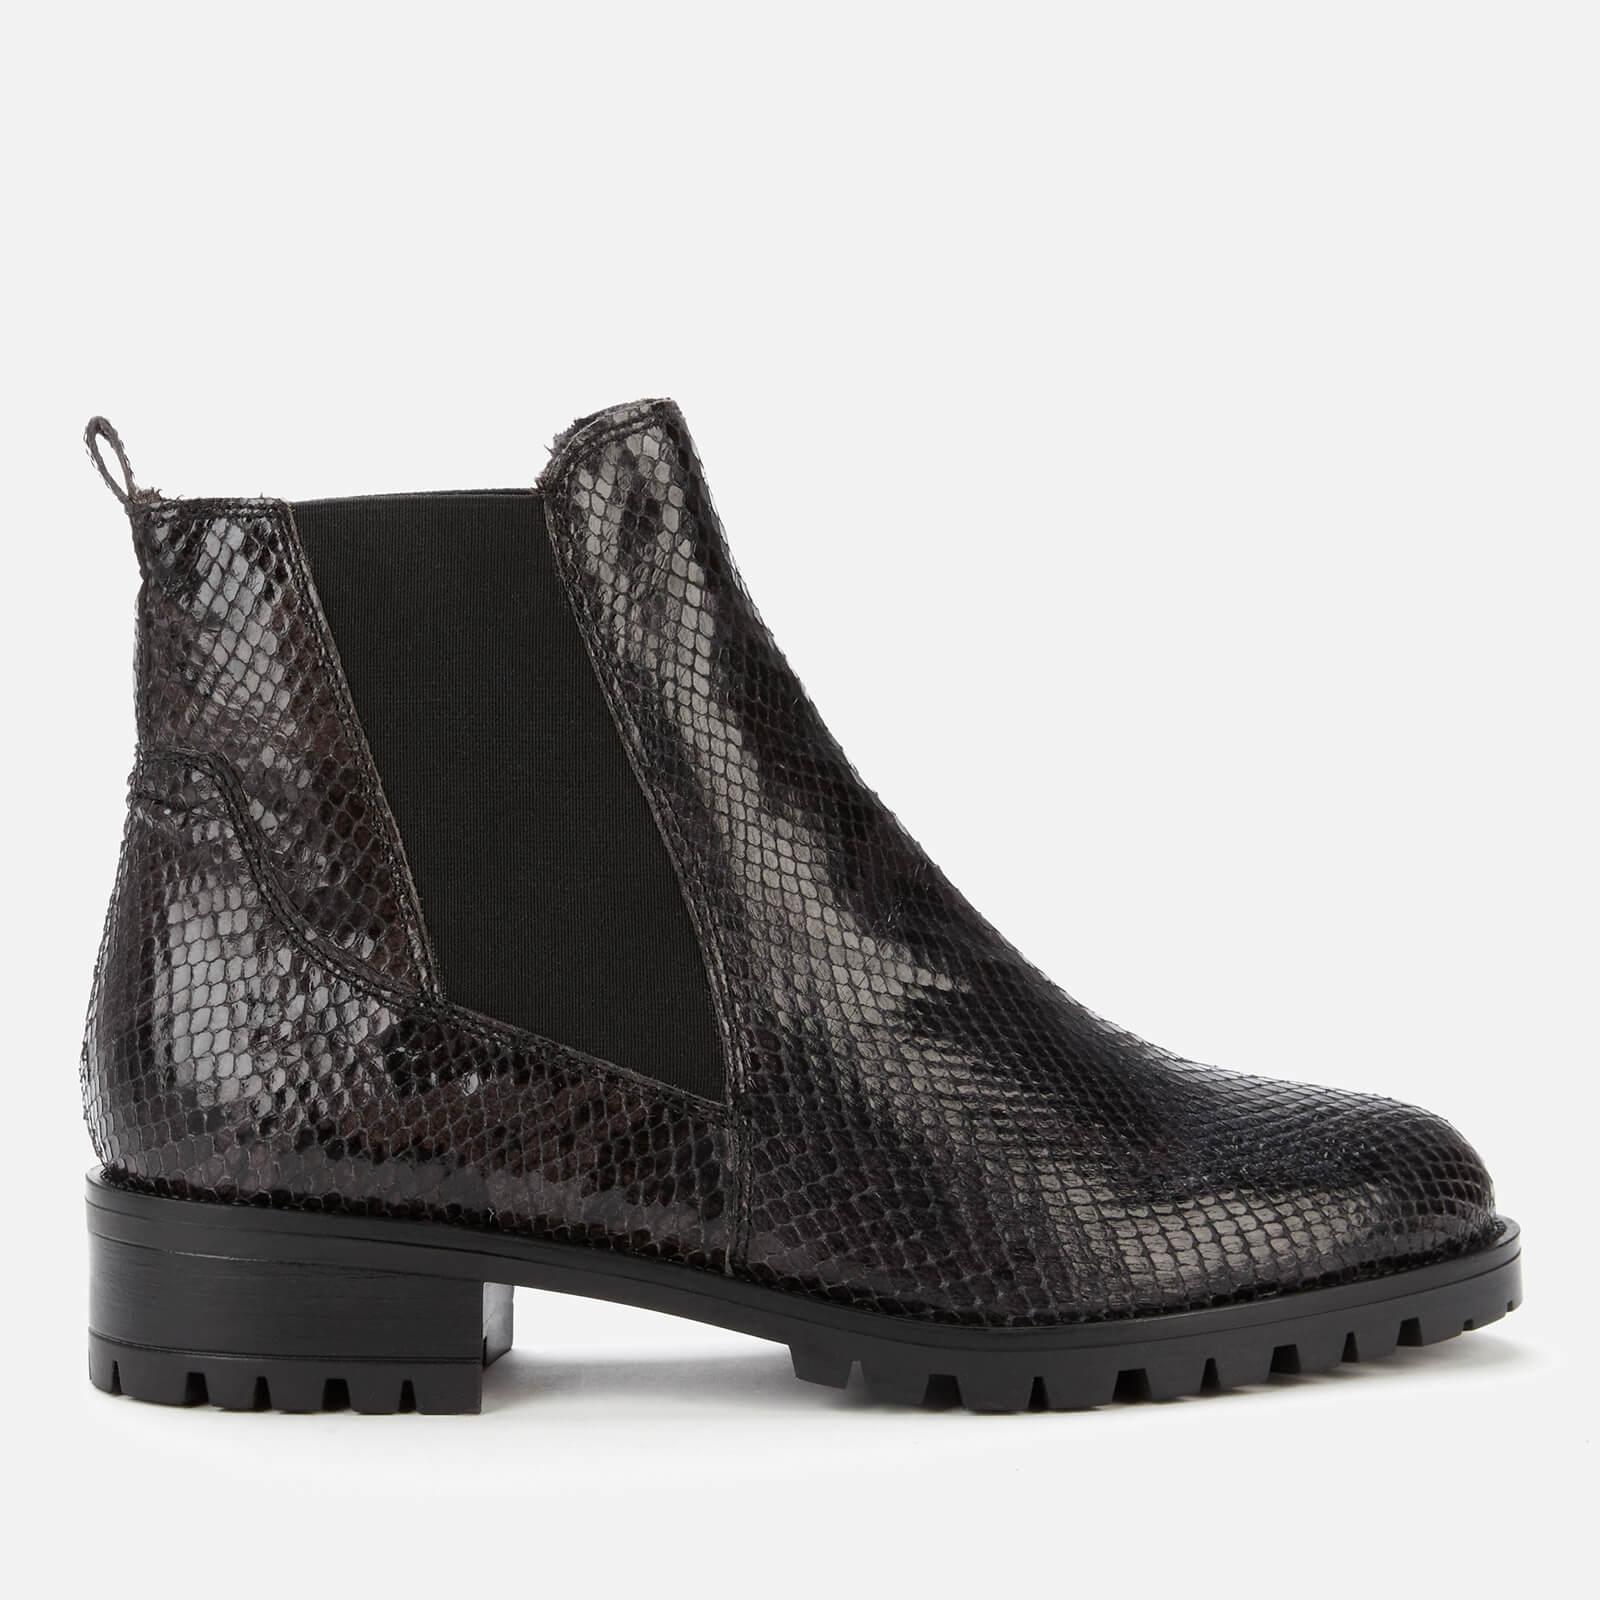 Dune Women's Powerful Reptile Print Leather Boots - Black - EU 39/UK 6